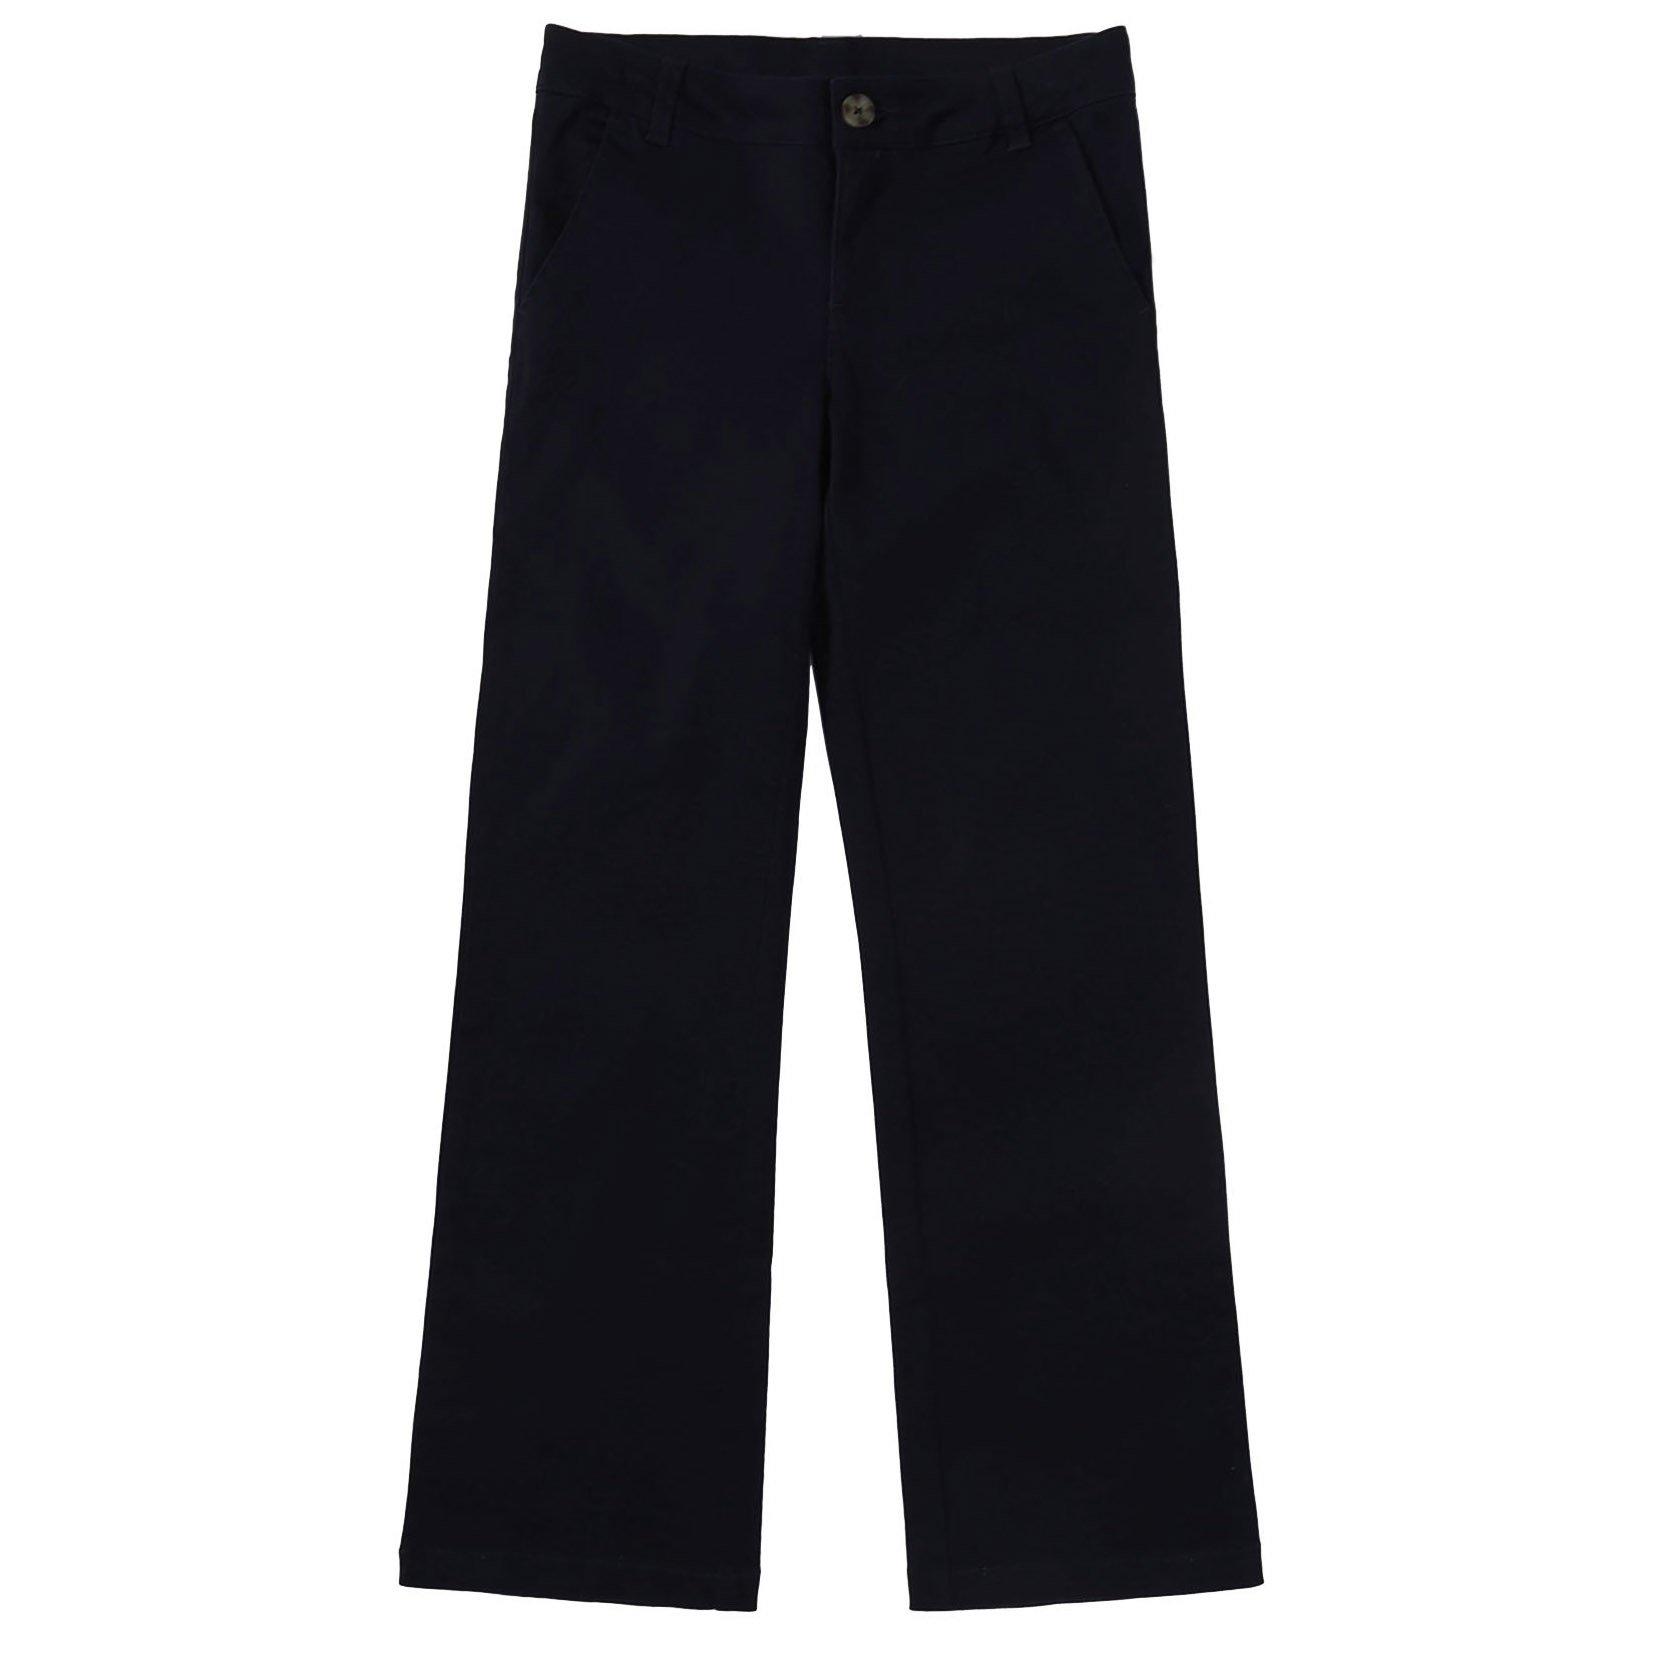 Bienzoe Girl's School Uniforms Cotton Stretchy Twill Adjust Waist Flat Front Pants Black Size 6